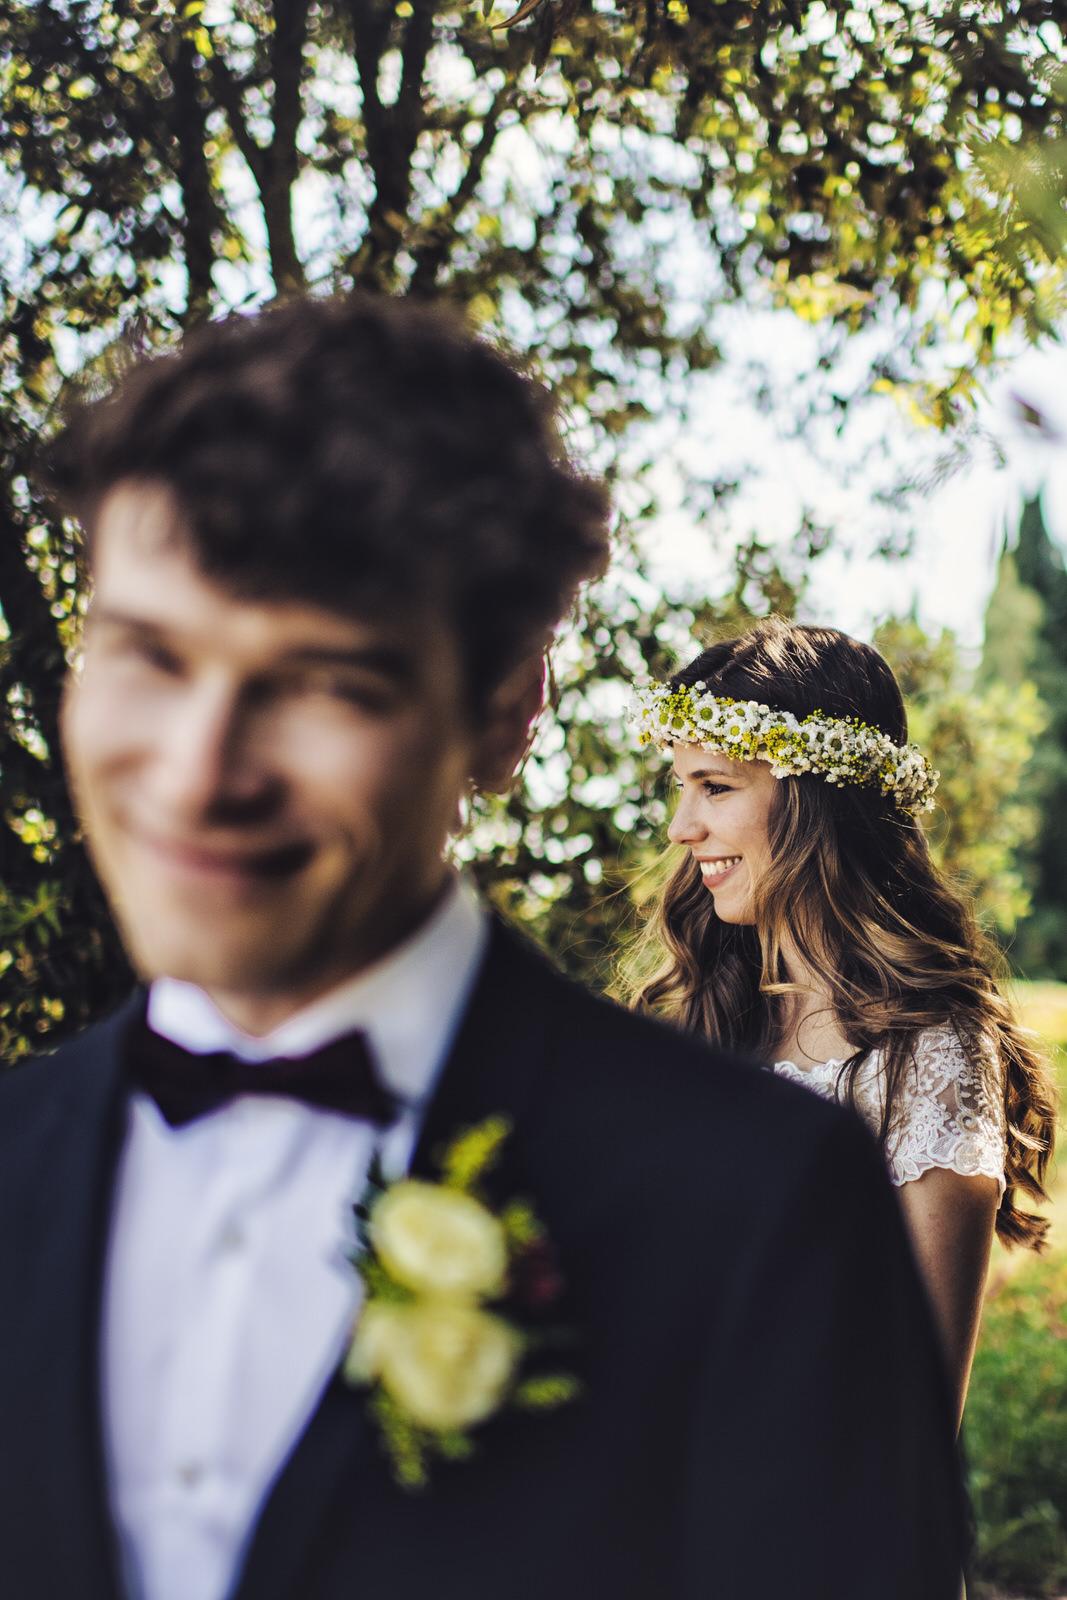 wedding photographer in italy-venice-tuscany-florence-amalfi coast-como lake-villa del balbianello-siena-amalfi-ravello-belmond-villa cimbrone9